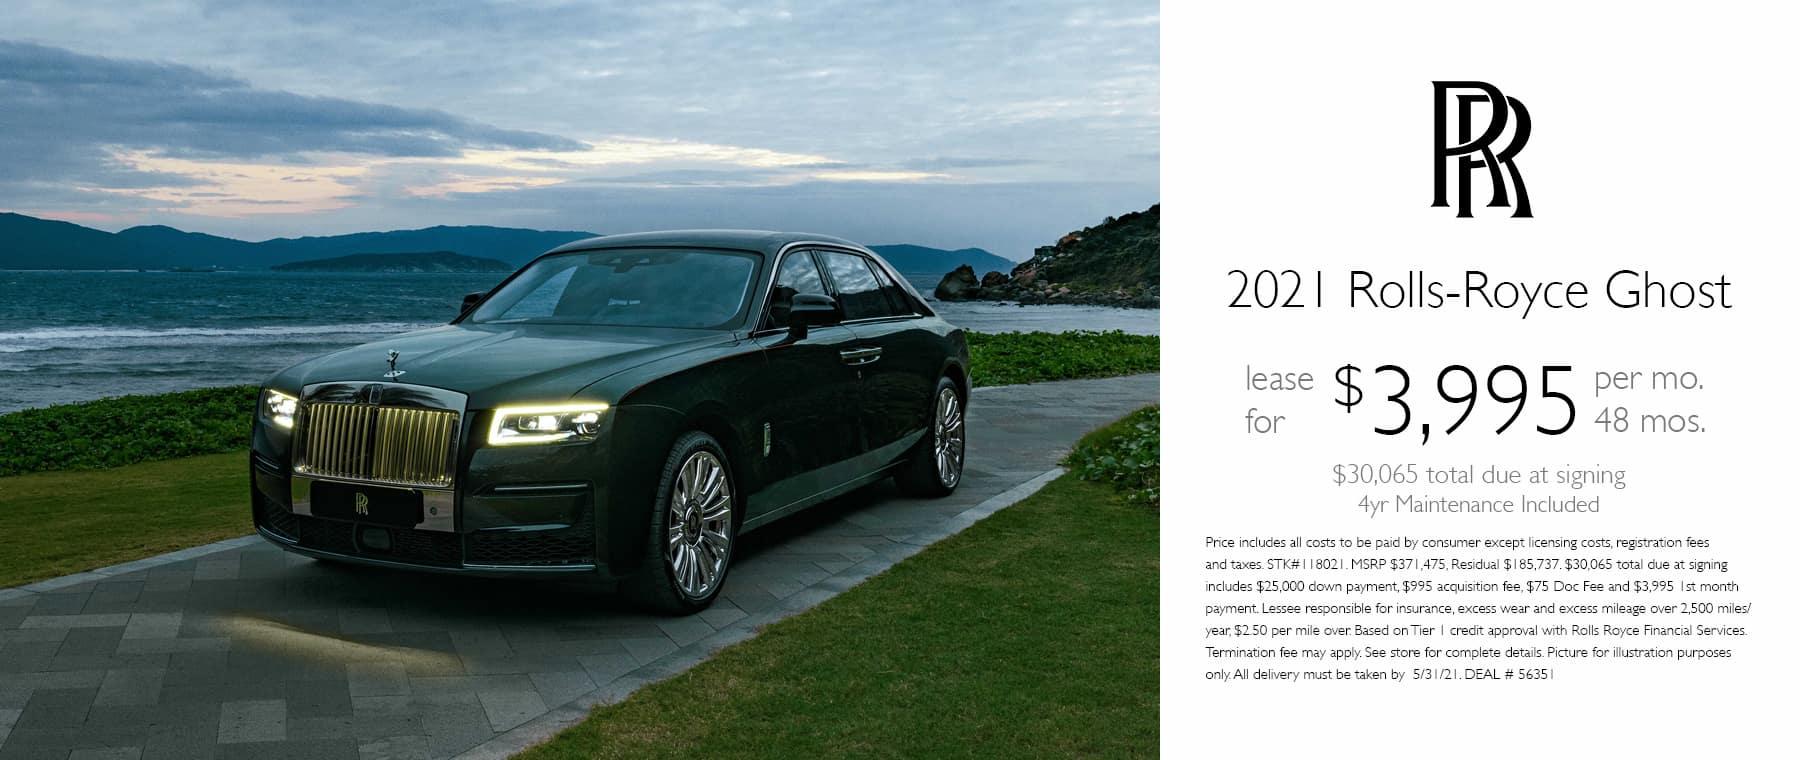 MMC-Exotics-Rolls-Royce-1800×760 MAY 2021 Ghost